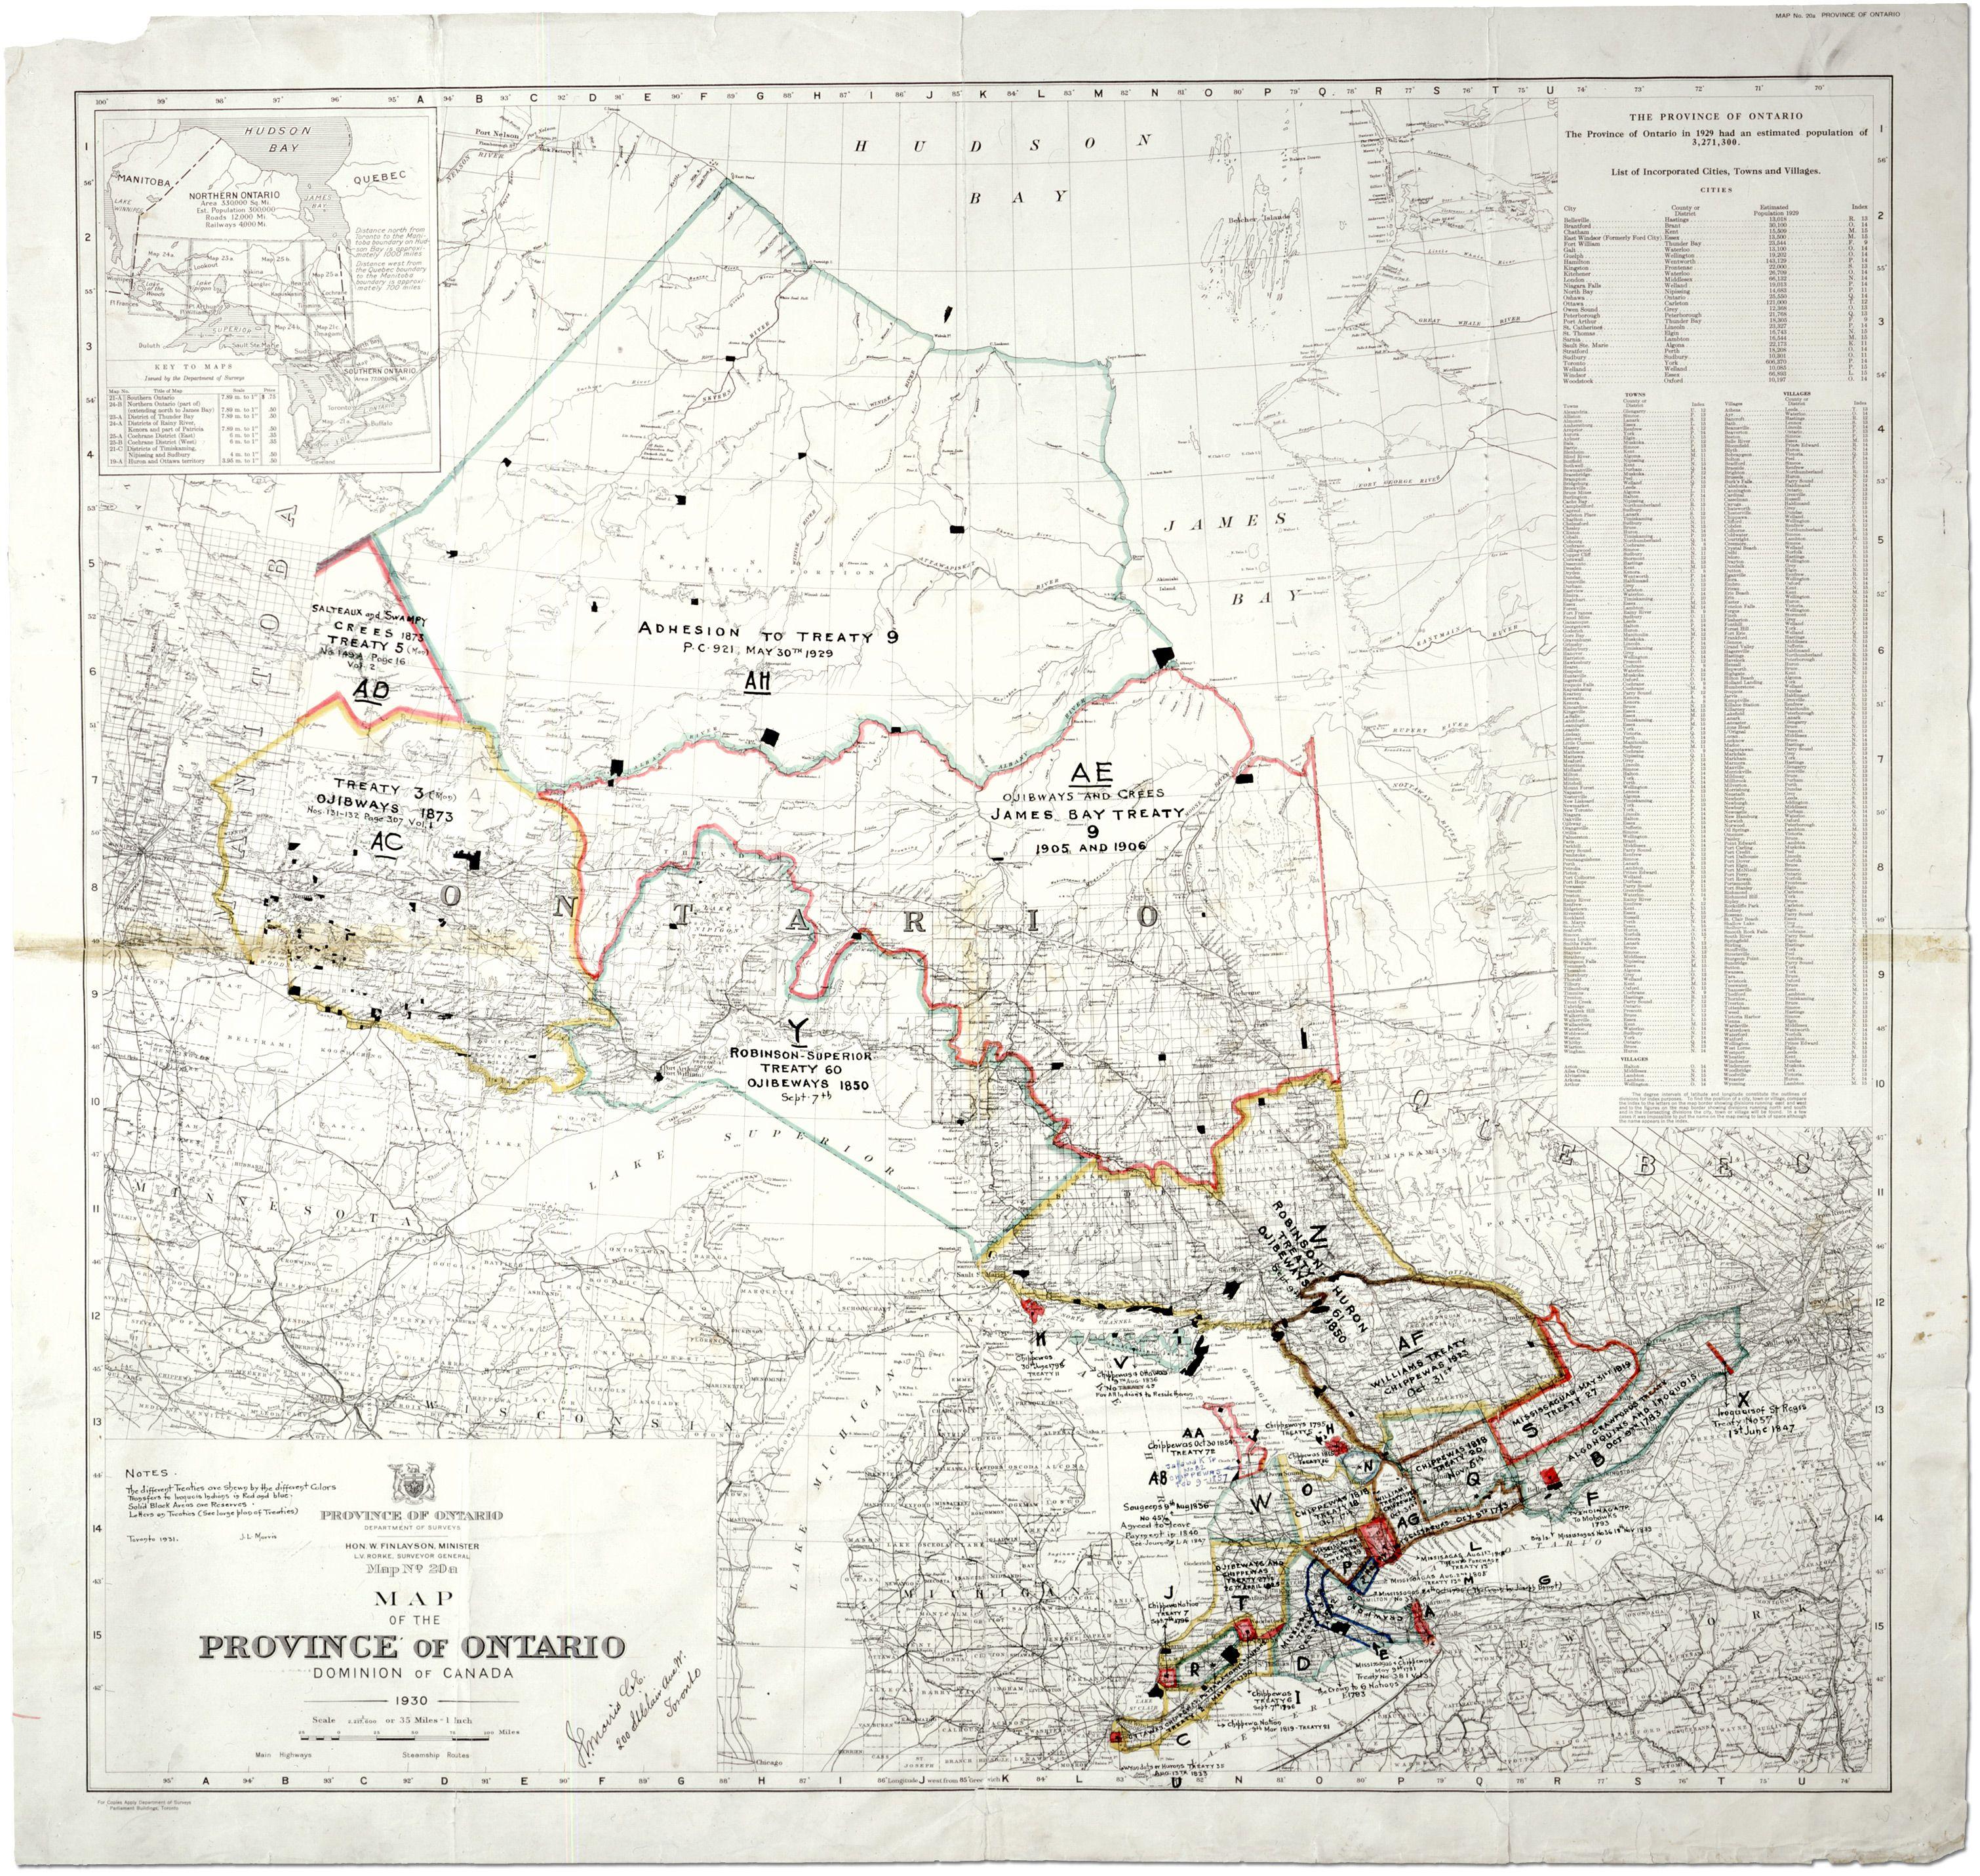 Map showing Indian treaties in Ontario | Treaty | Cree